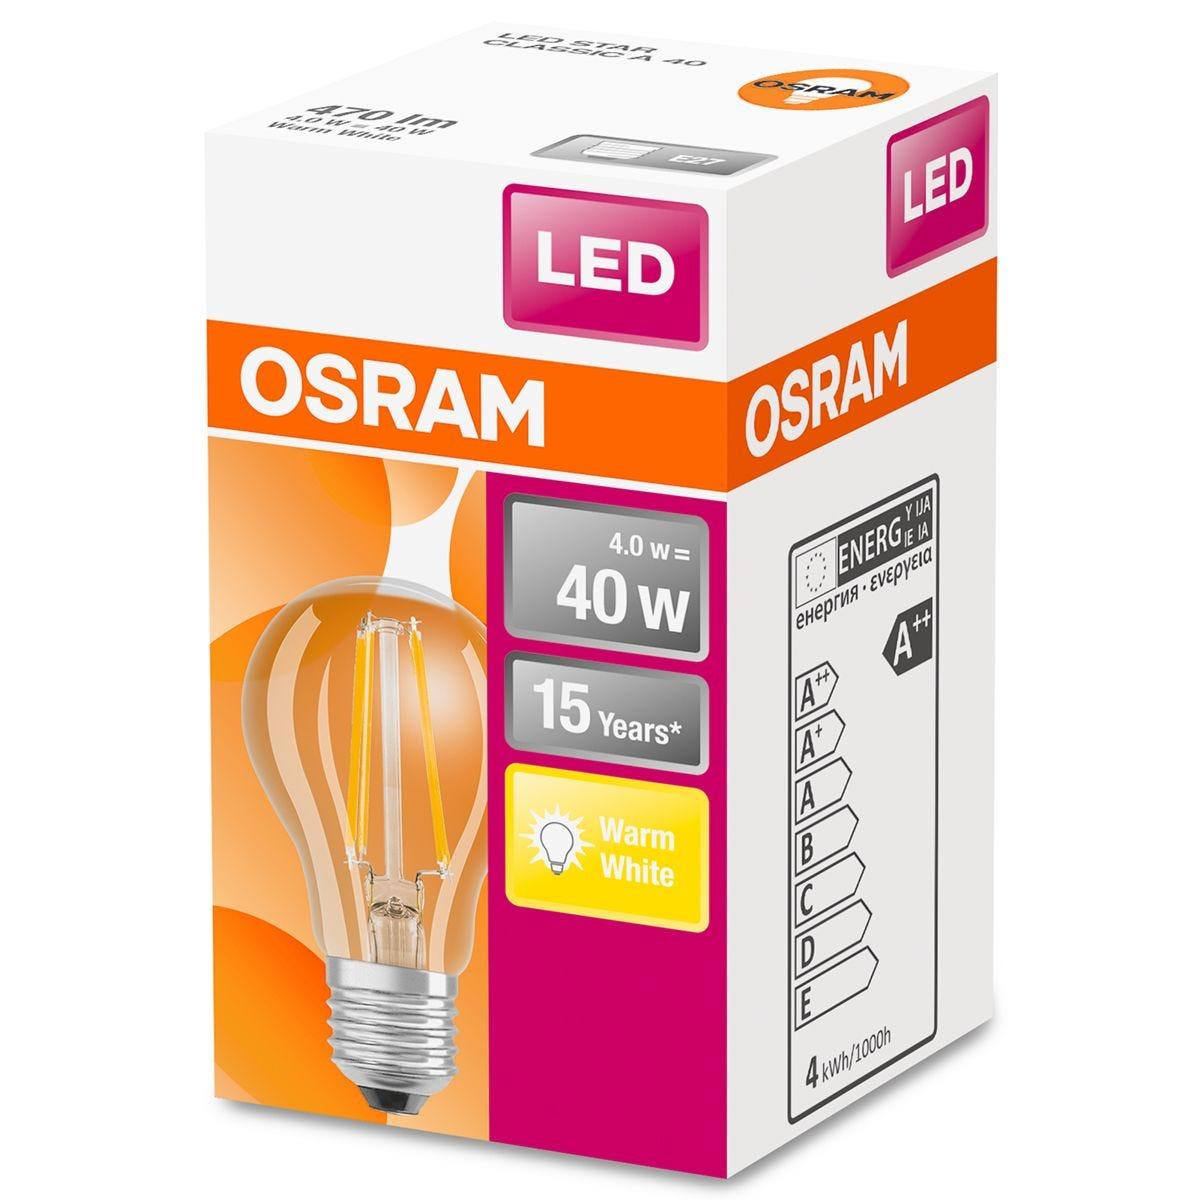 Osram 40W Classic A Filament ES LED Bulb - Warm White